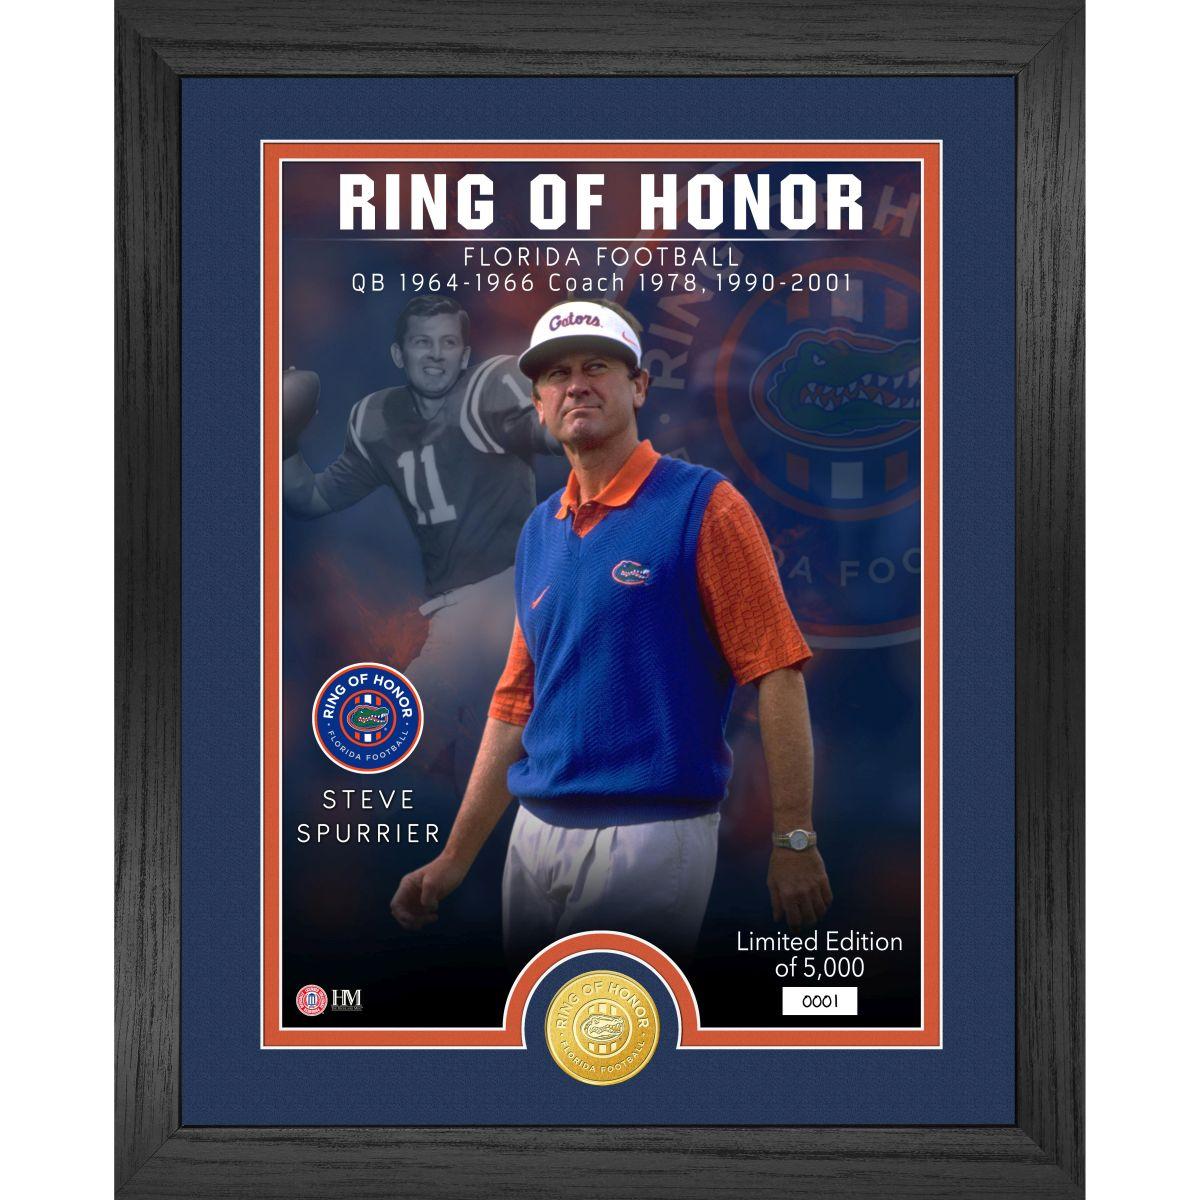 Steve Spurrier Florida Gators 2021 Ring of Honor Bronze Coin Photo Mint